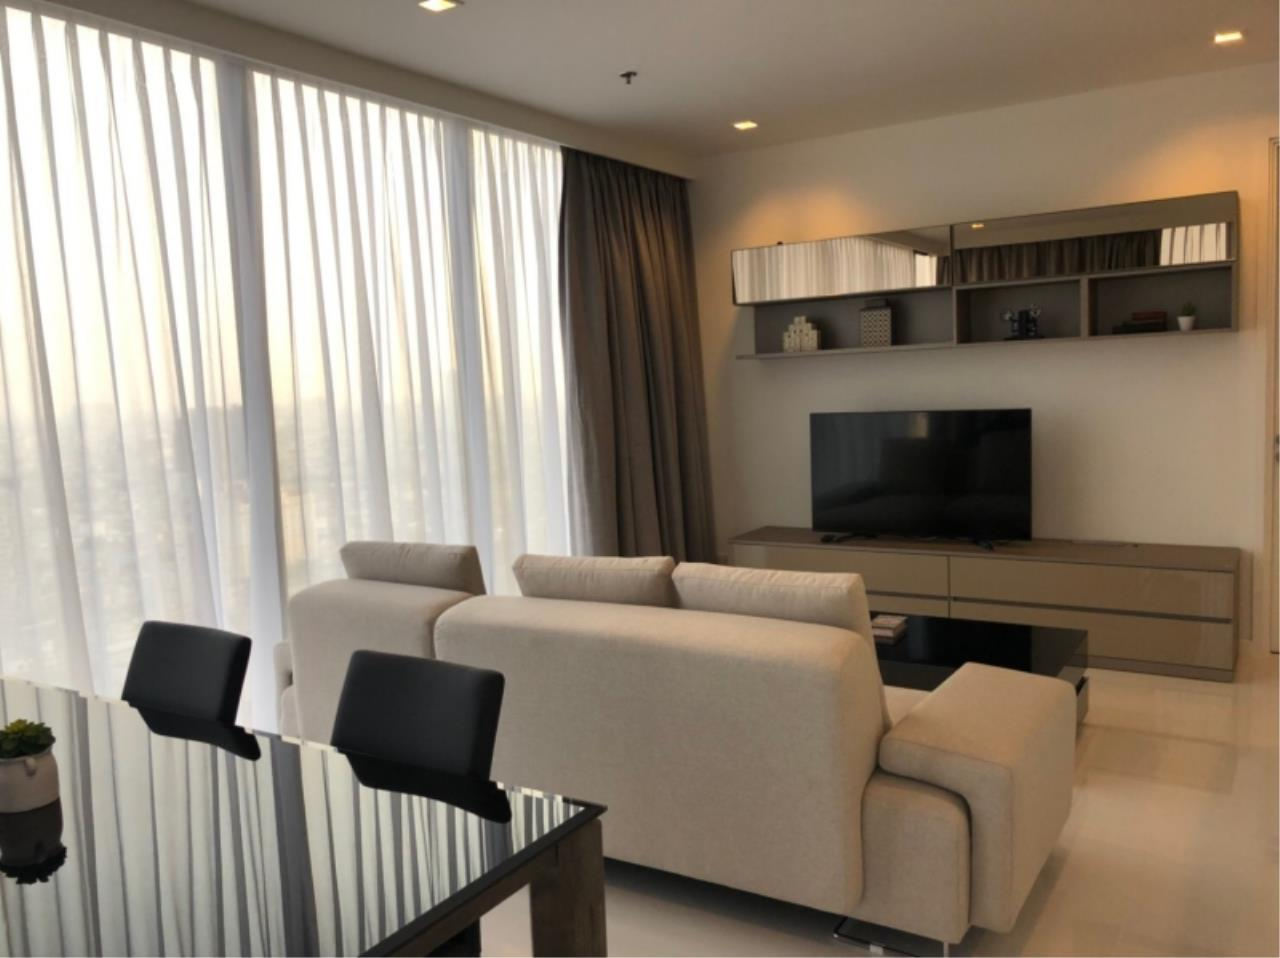 Century21 Skylux Agency's Nara 9 by Eastern Star / Condo For Rent / 2 Bedroom / 78 SQM / BTS Chong Nonsi / Bangkok 4